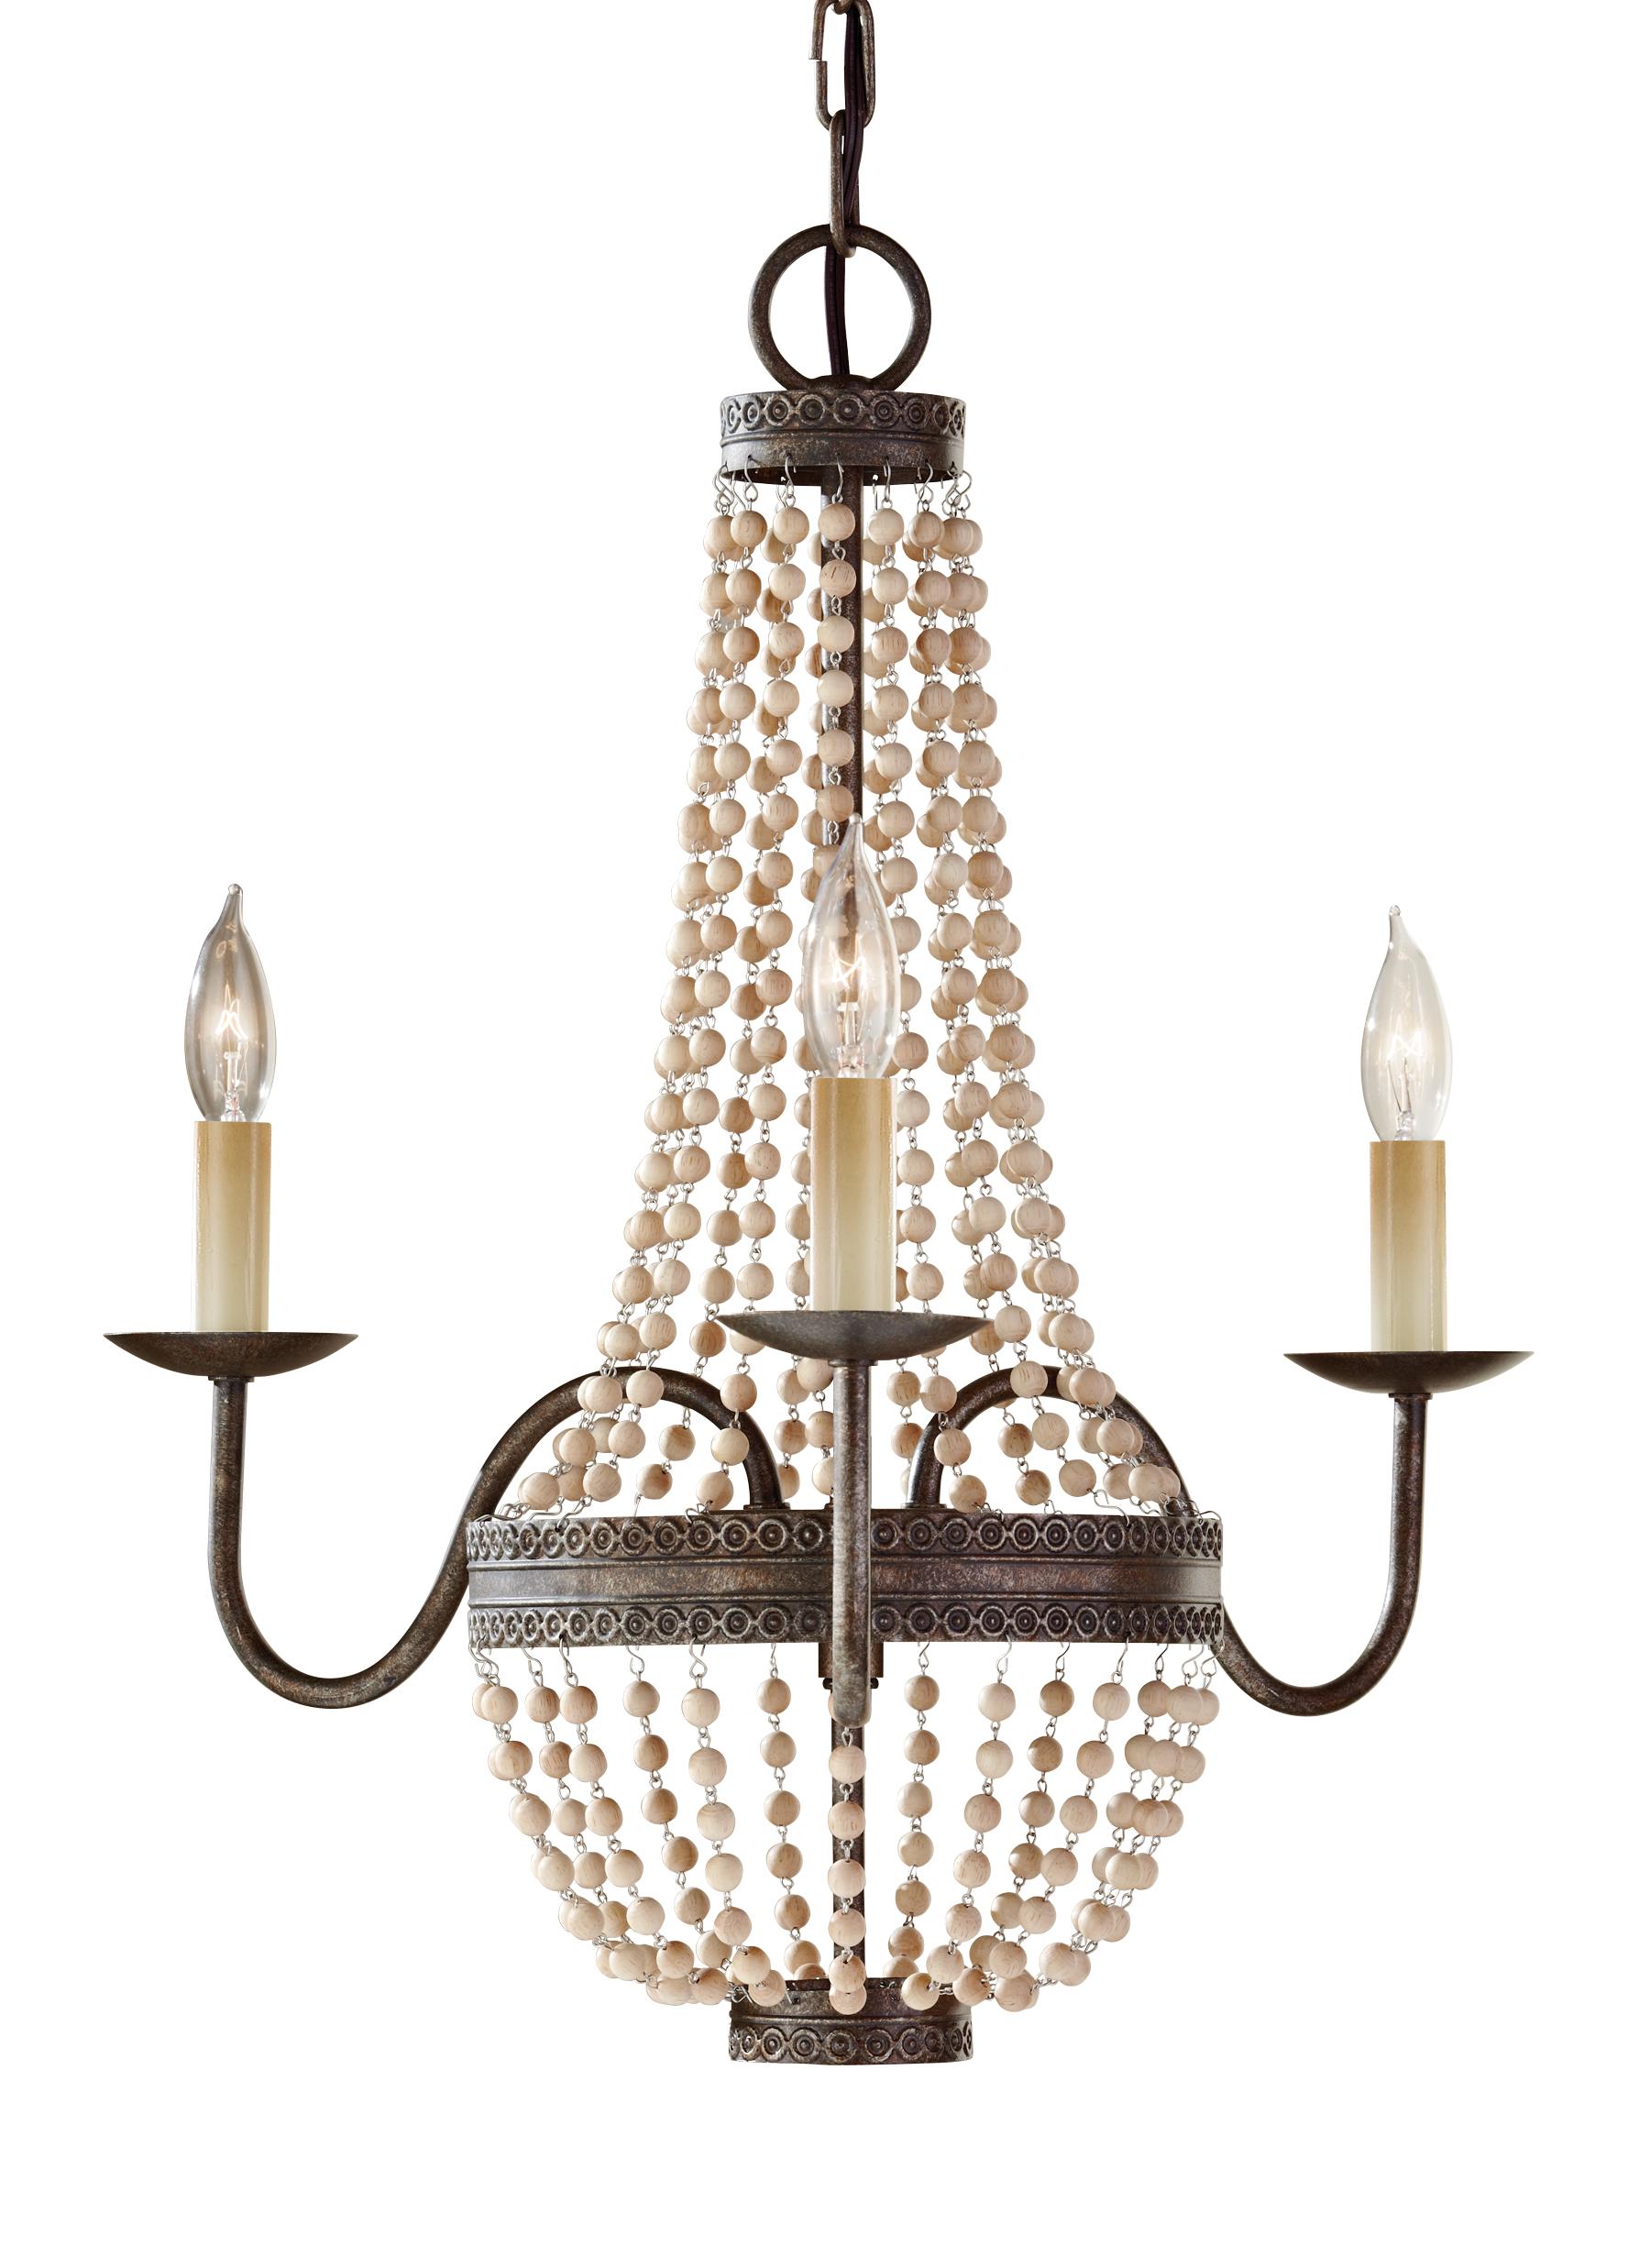 F27553pbr3 light chandelierperuvian bronze loading zoom arubaitofo Image collections